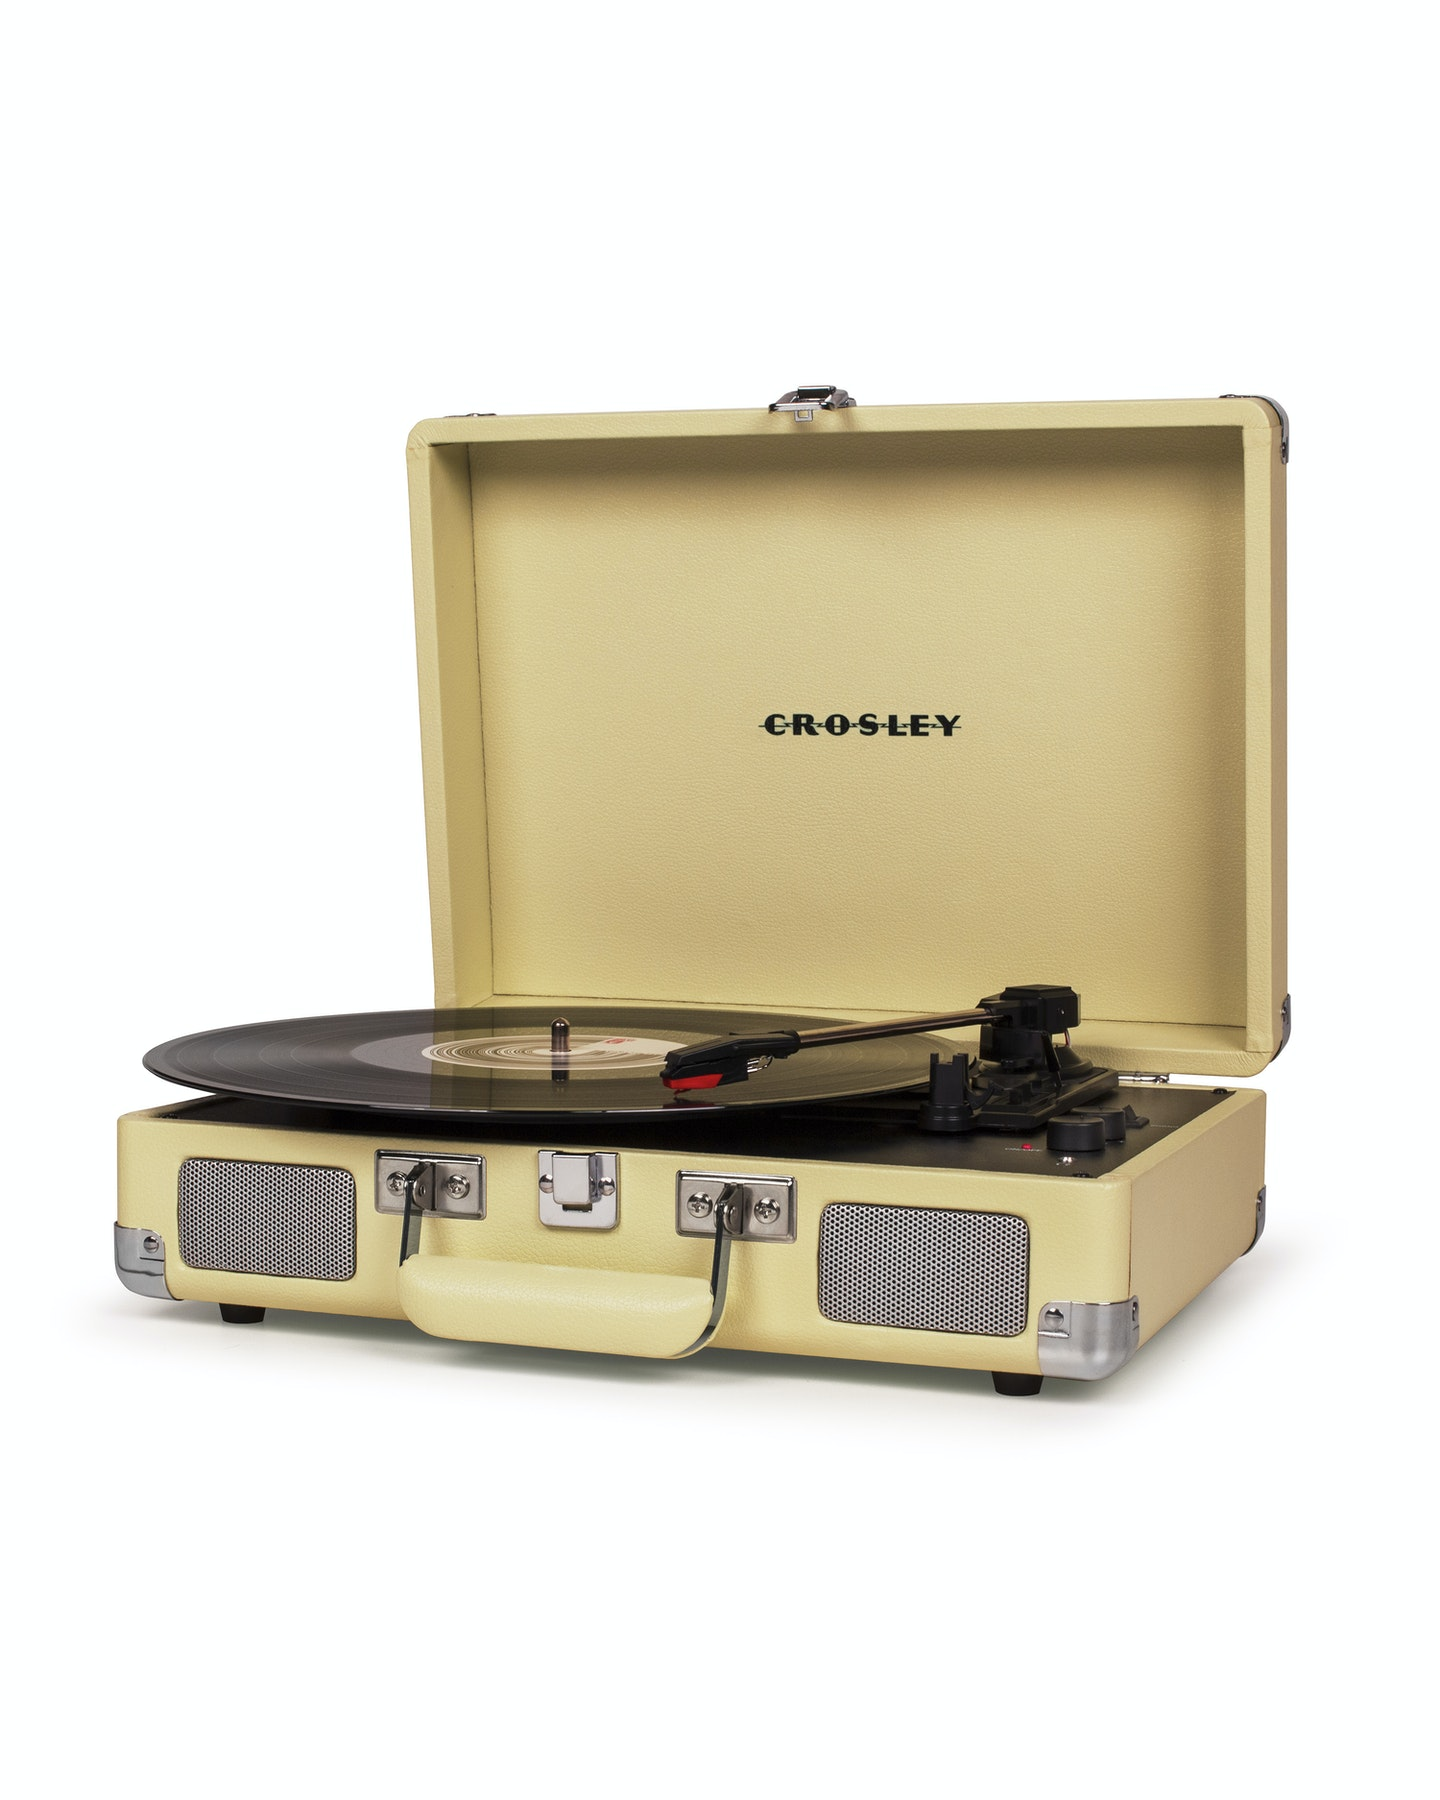 Crosley Crosley Cruiser Deluxe Portable Turntable Fawn Fawn